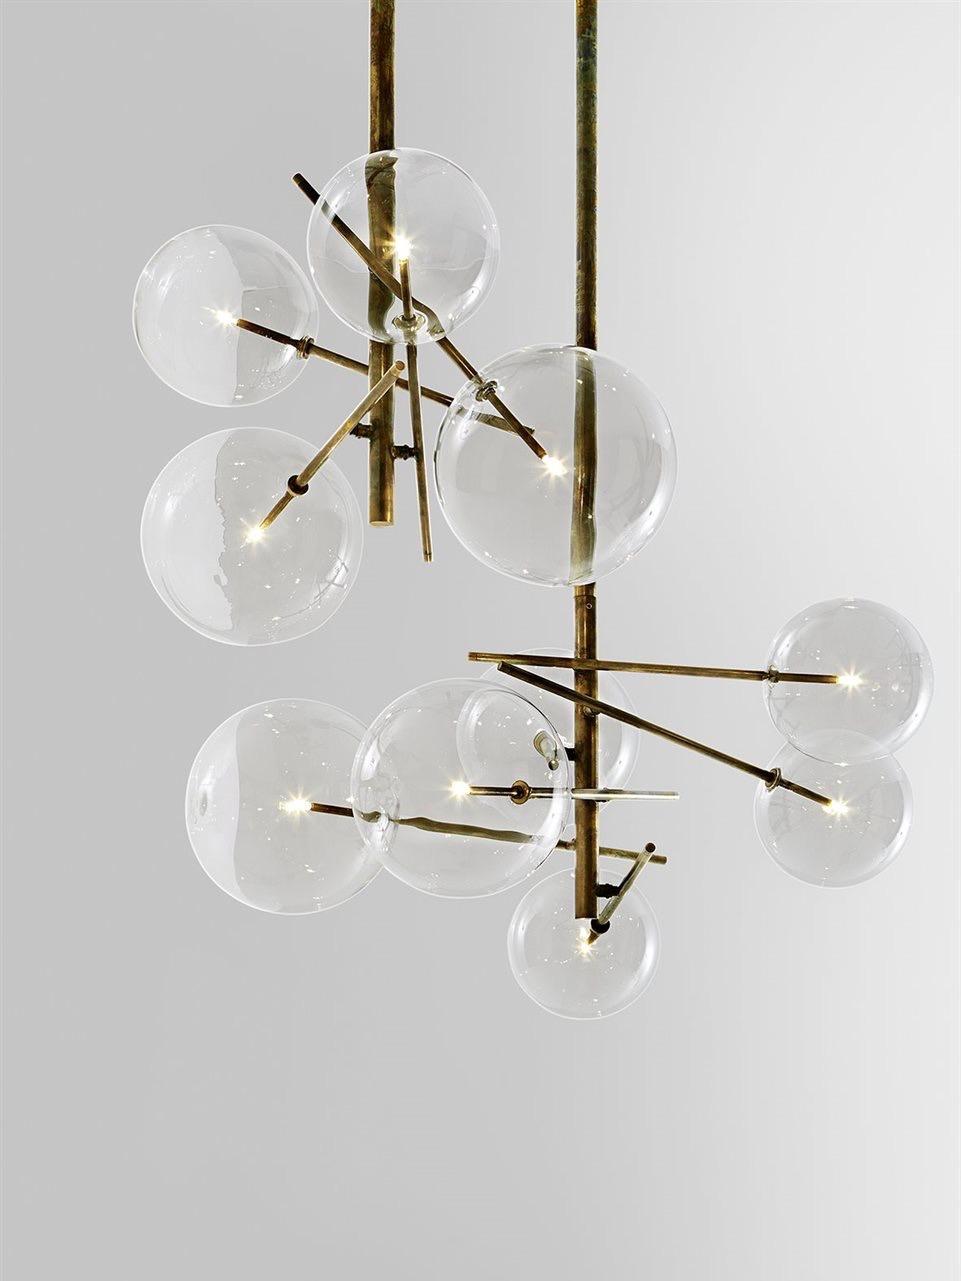 Bolle Lampada <i><br>from 16.400 DKK</i>